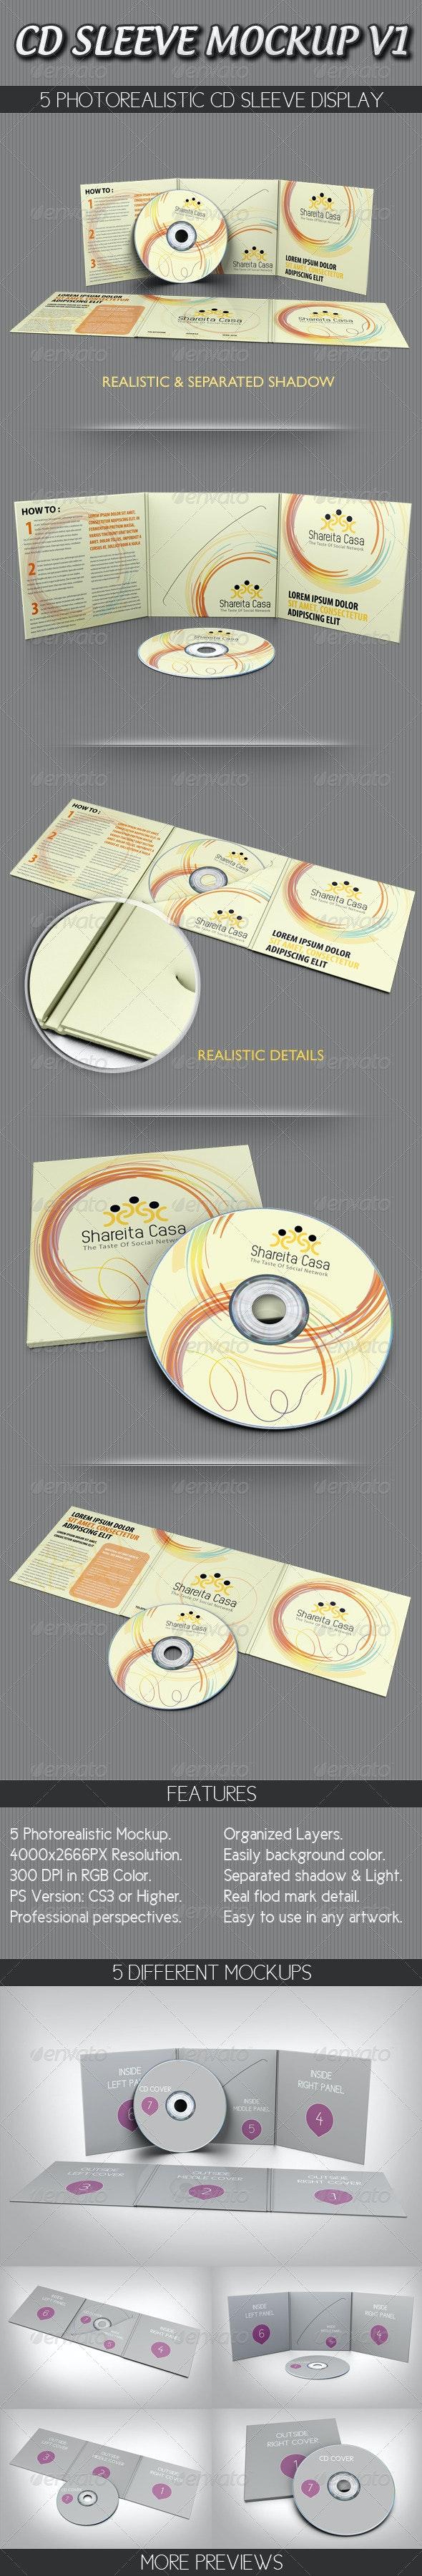 CD Sleeve Mockup V1 - Discs Packaging